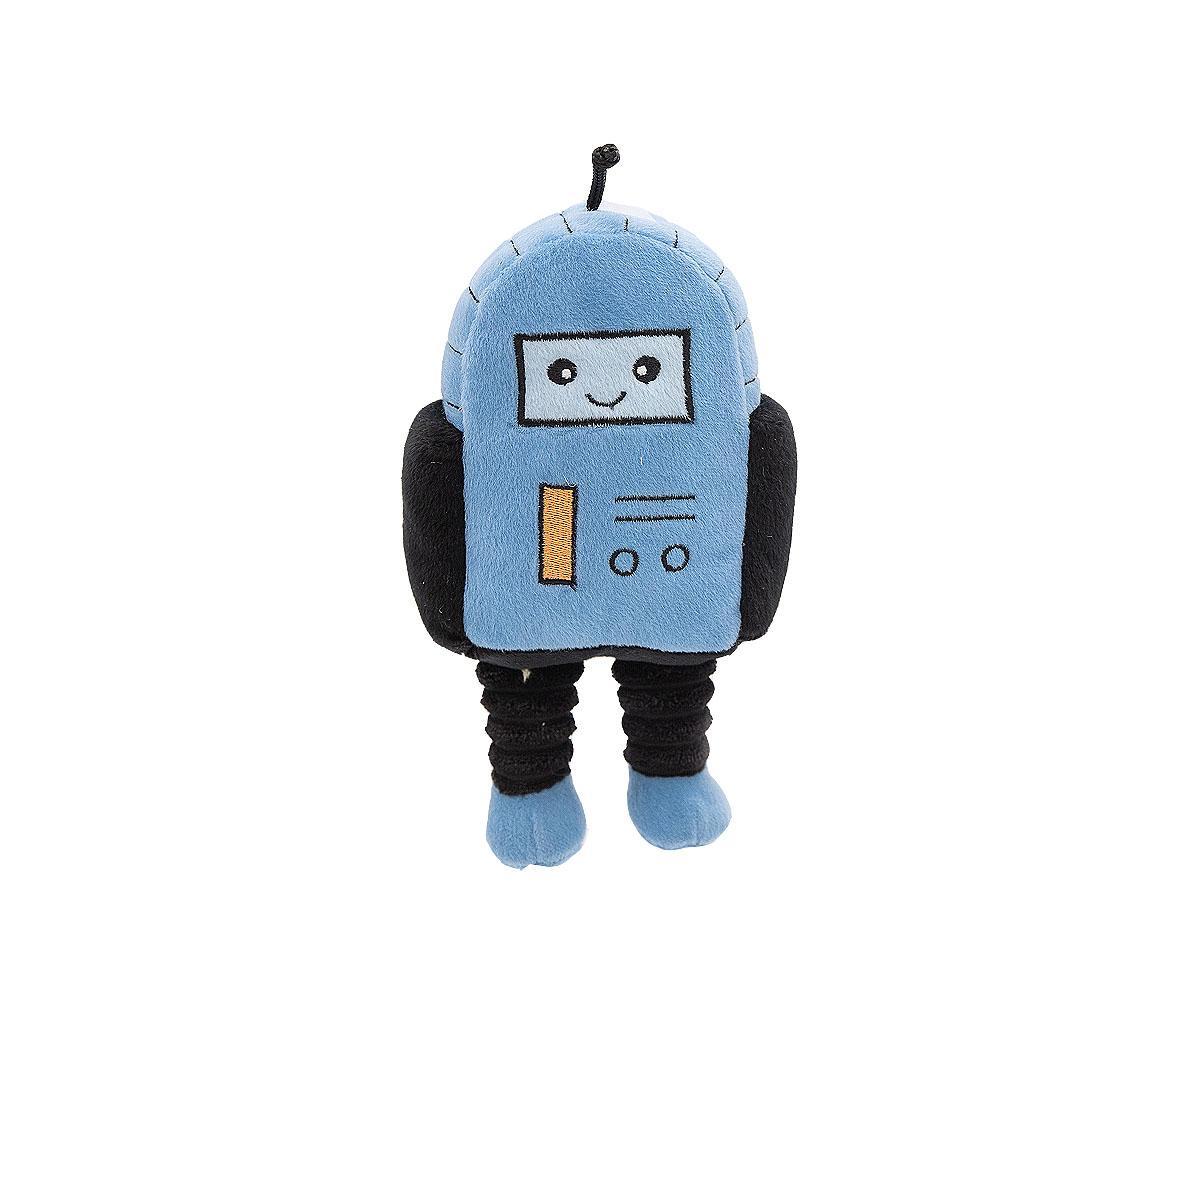 ZippyPaws Storybook Space Dog Toy - Rosco the Robot